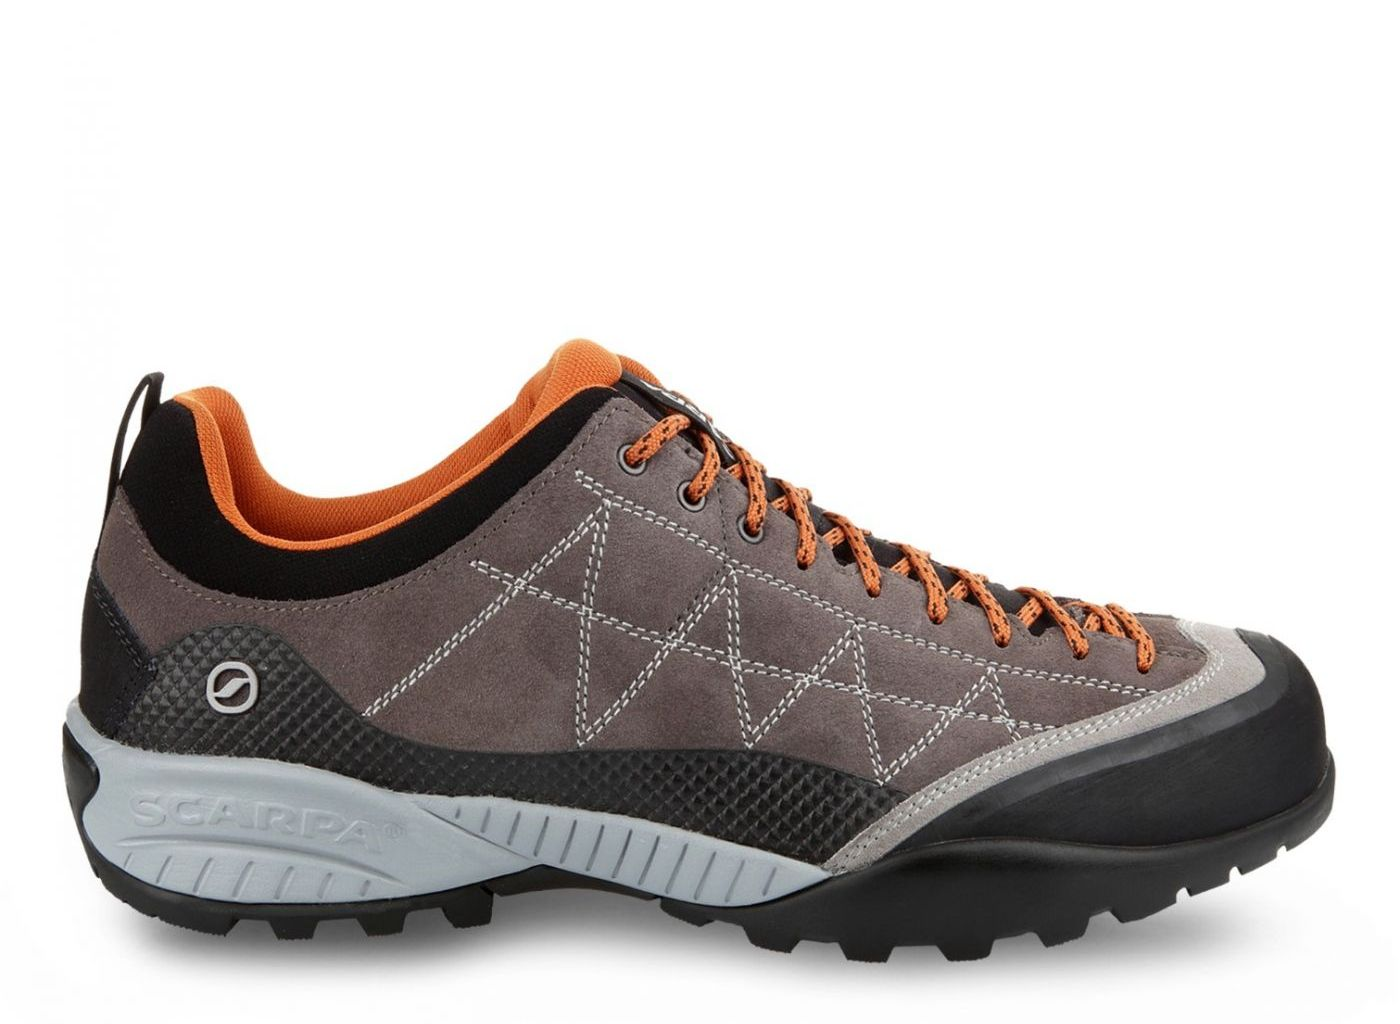 Gear Review Scarpa Zen Pro Approach Shoes